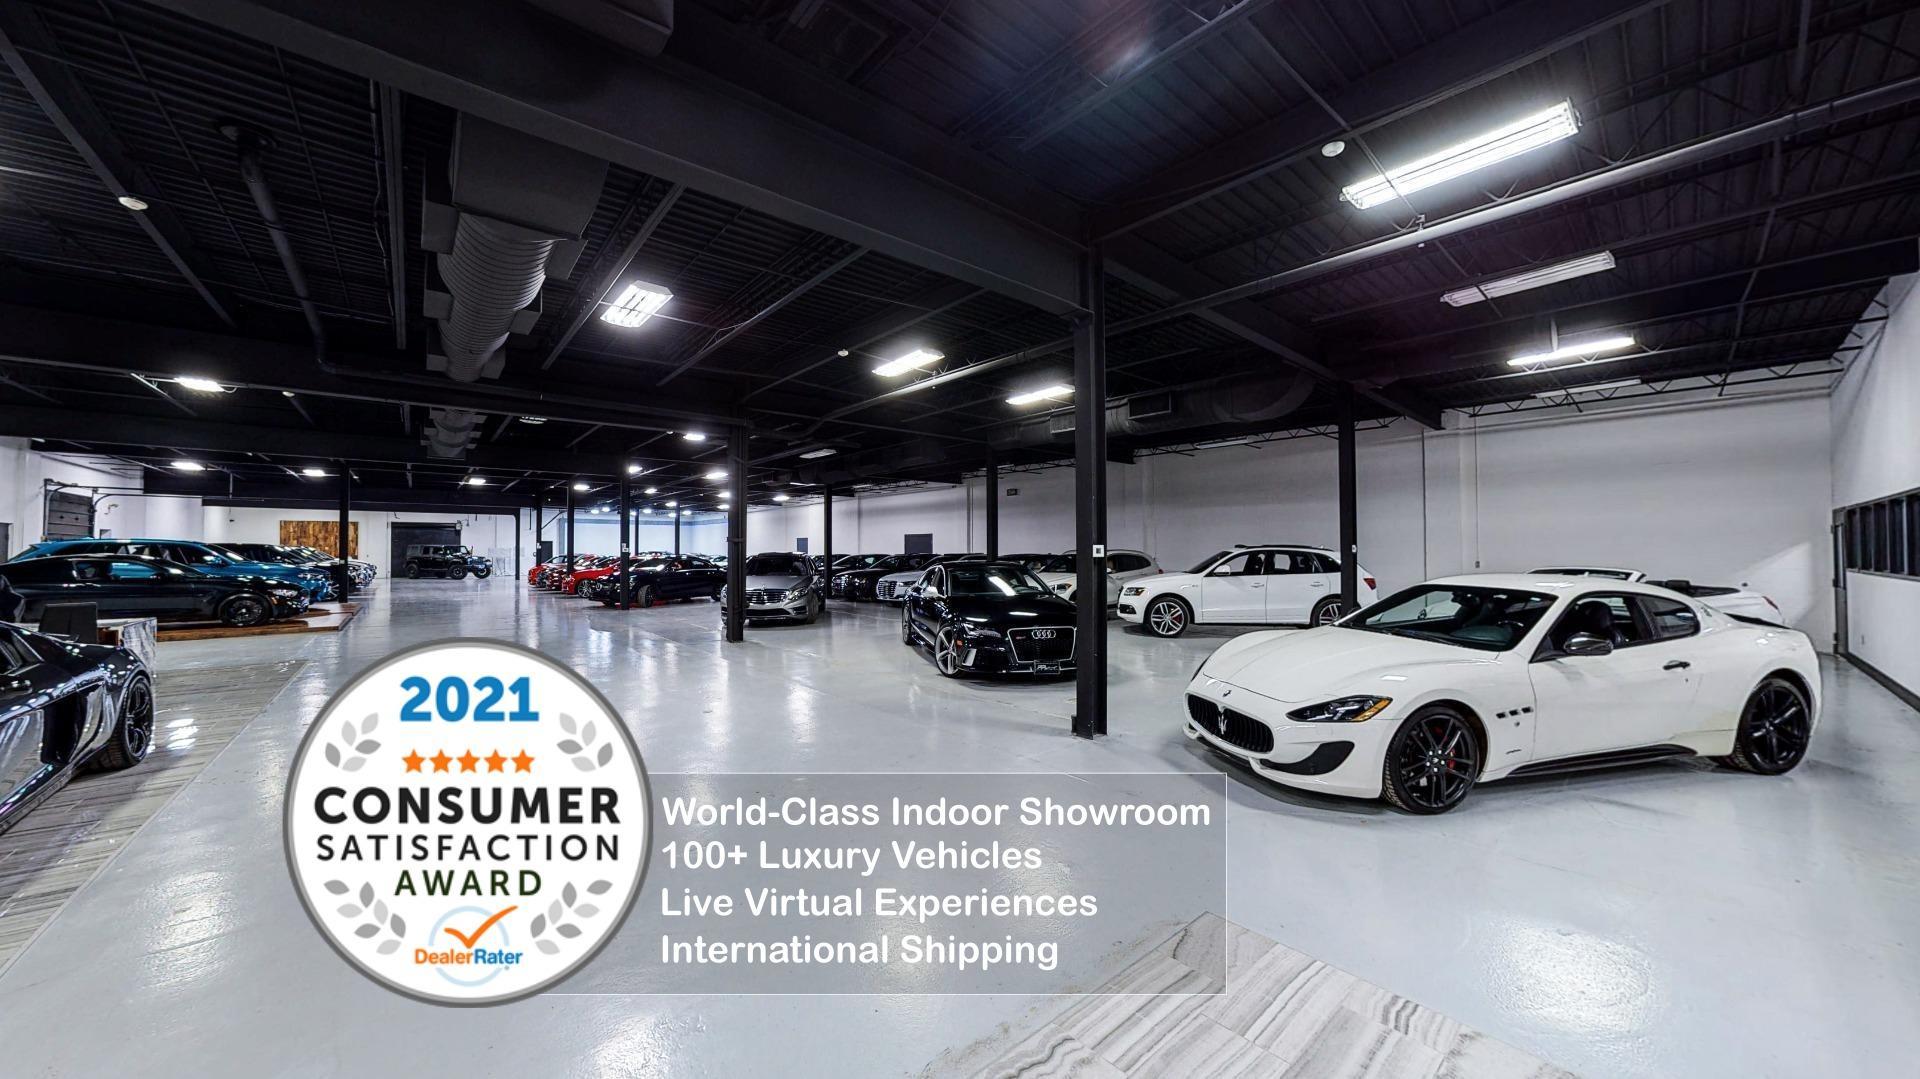 Used 2017 Audi A6 3.0T quattro Prestige Technik for sale $35,995 at Perfect Auto Collection in Akron OH 44310 3